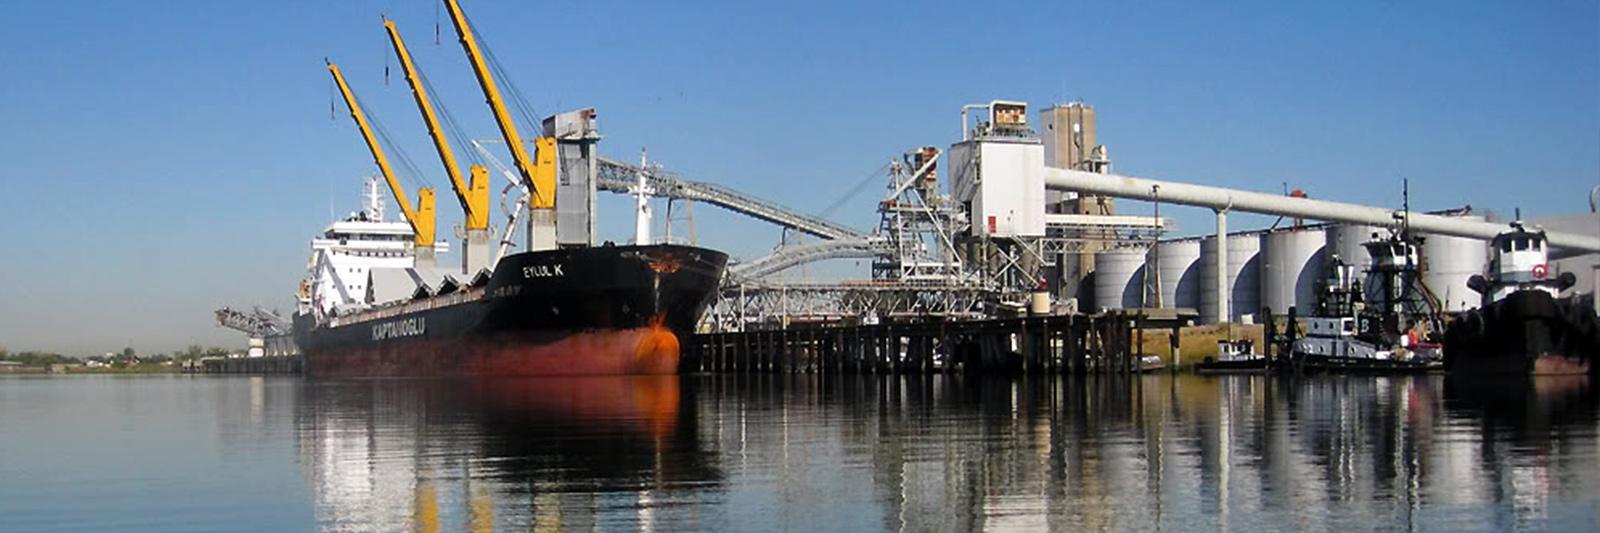 shipatport2.jpg